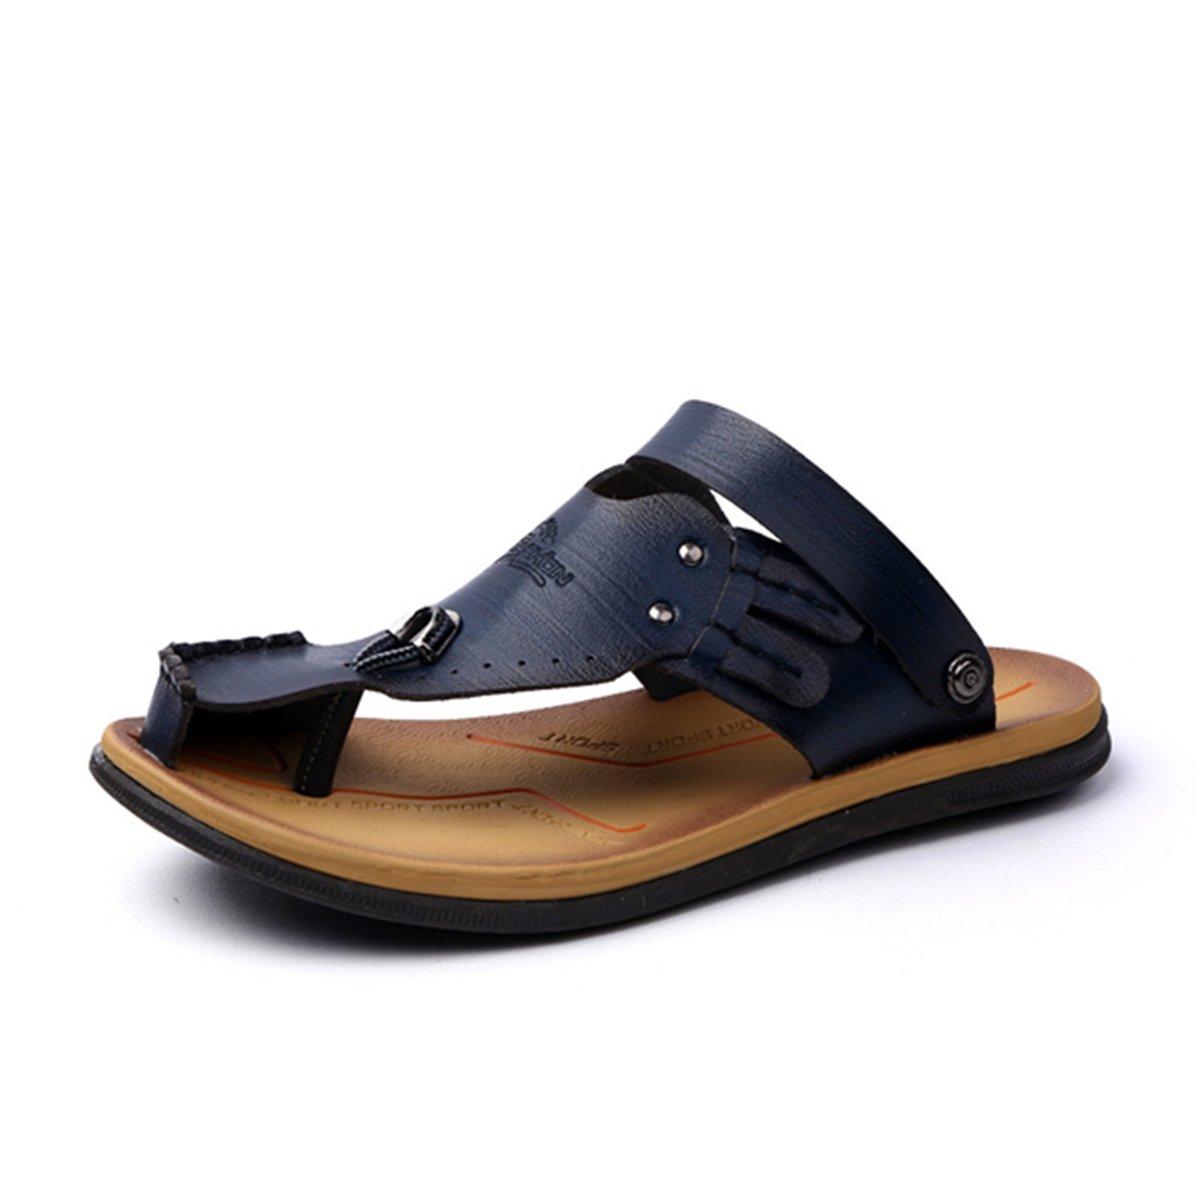 Gracosy Flip Flops, Unisex Zehentrenner Flache Hausschuhe Pantoletten Sommer Schuhe Slippers Weich Anti-Rutsch T-Strap Sandalen fuuml;r Herren Damenr  39 EU|Blau-c